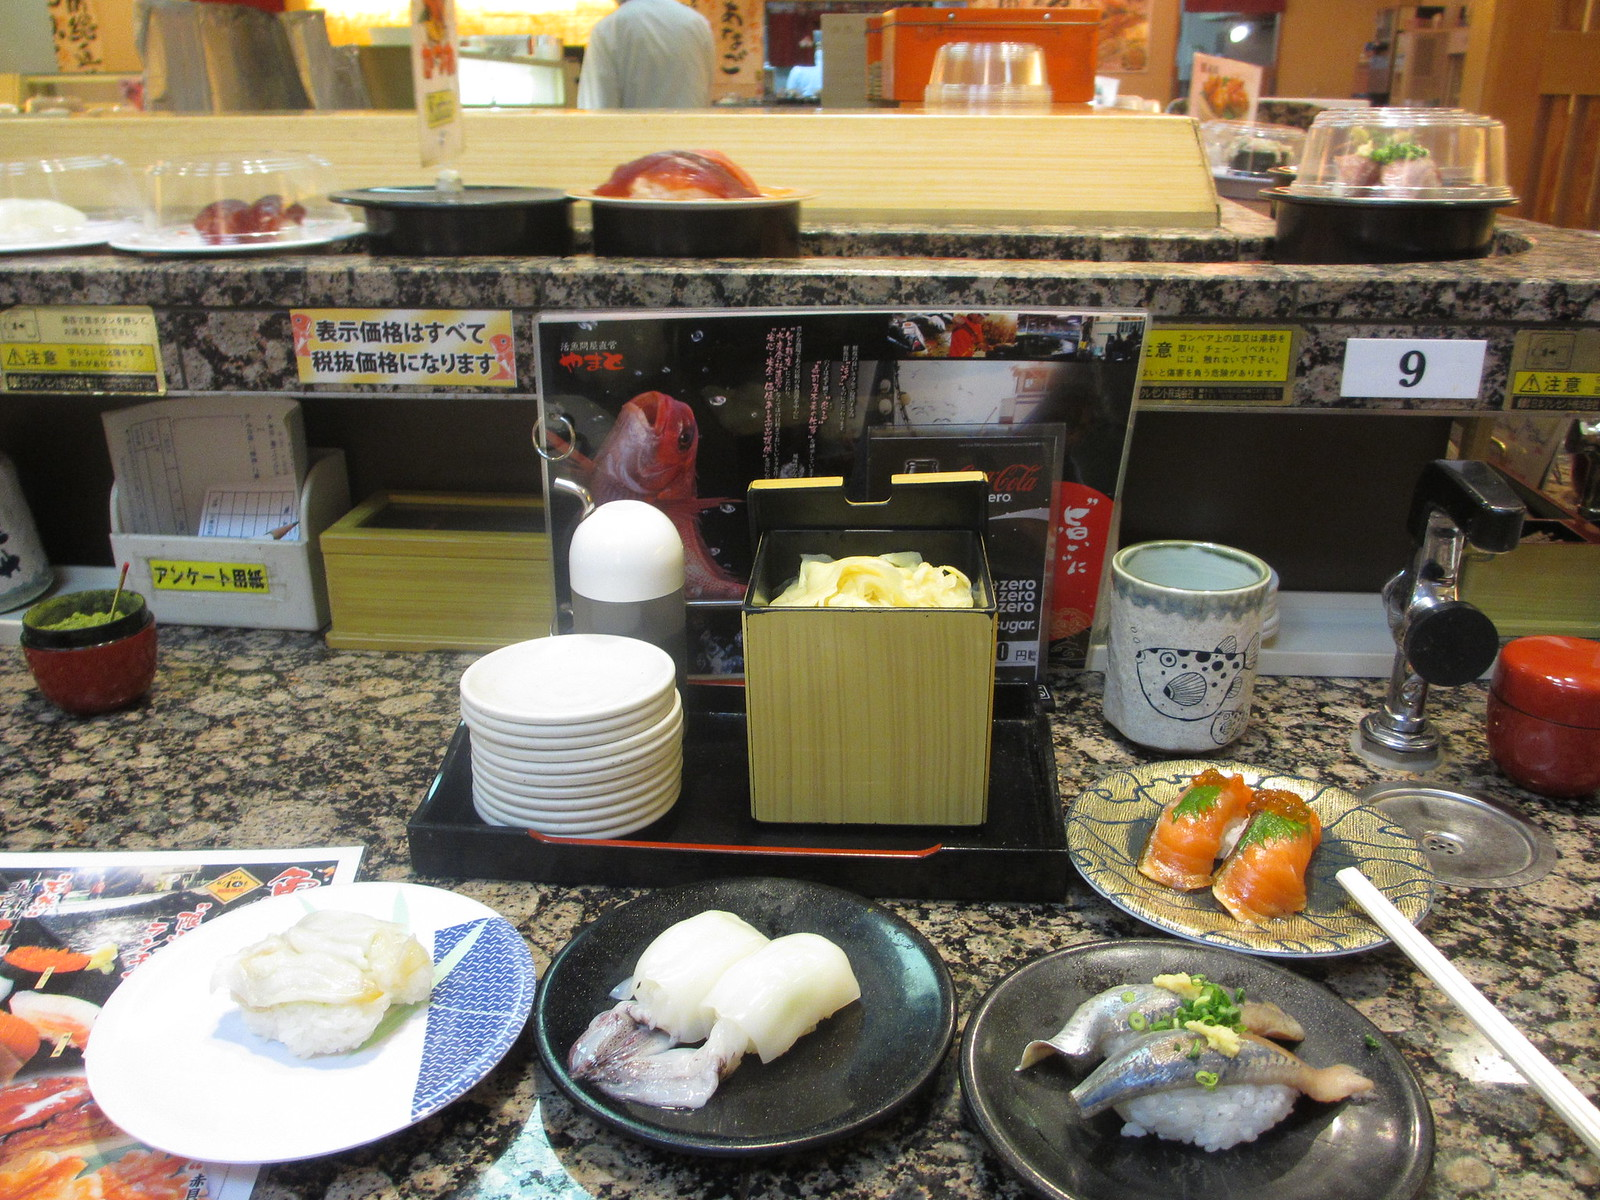 Sushi on a belt!